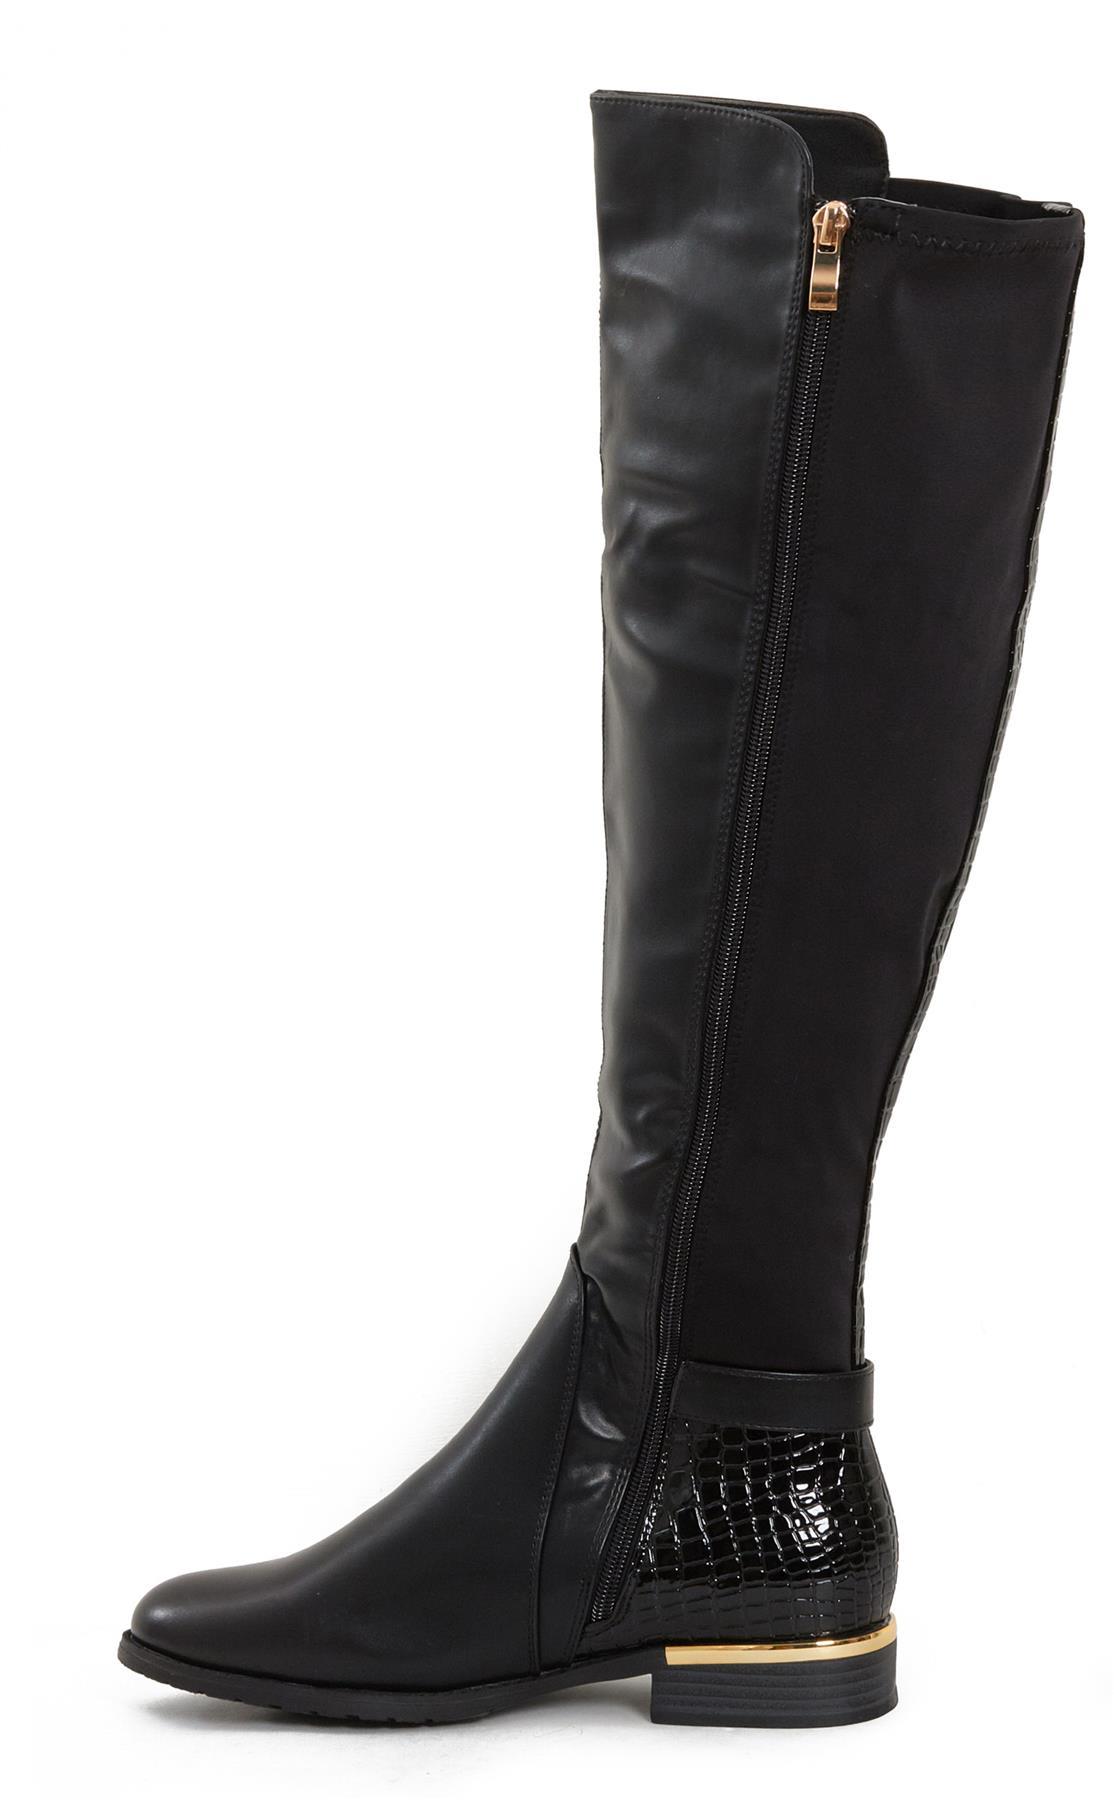 Womens-Ladies-Knee-High-Gold-Detail-Low-Block-Heel-Zip-Up-PU-Suede-Black-Boots thumbnail 5